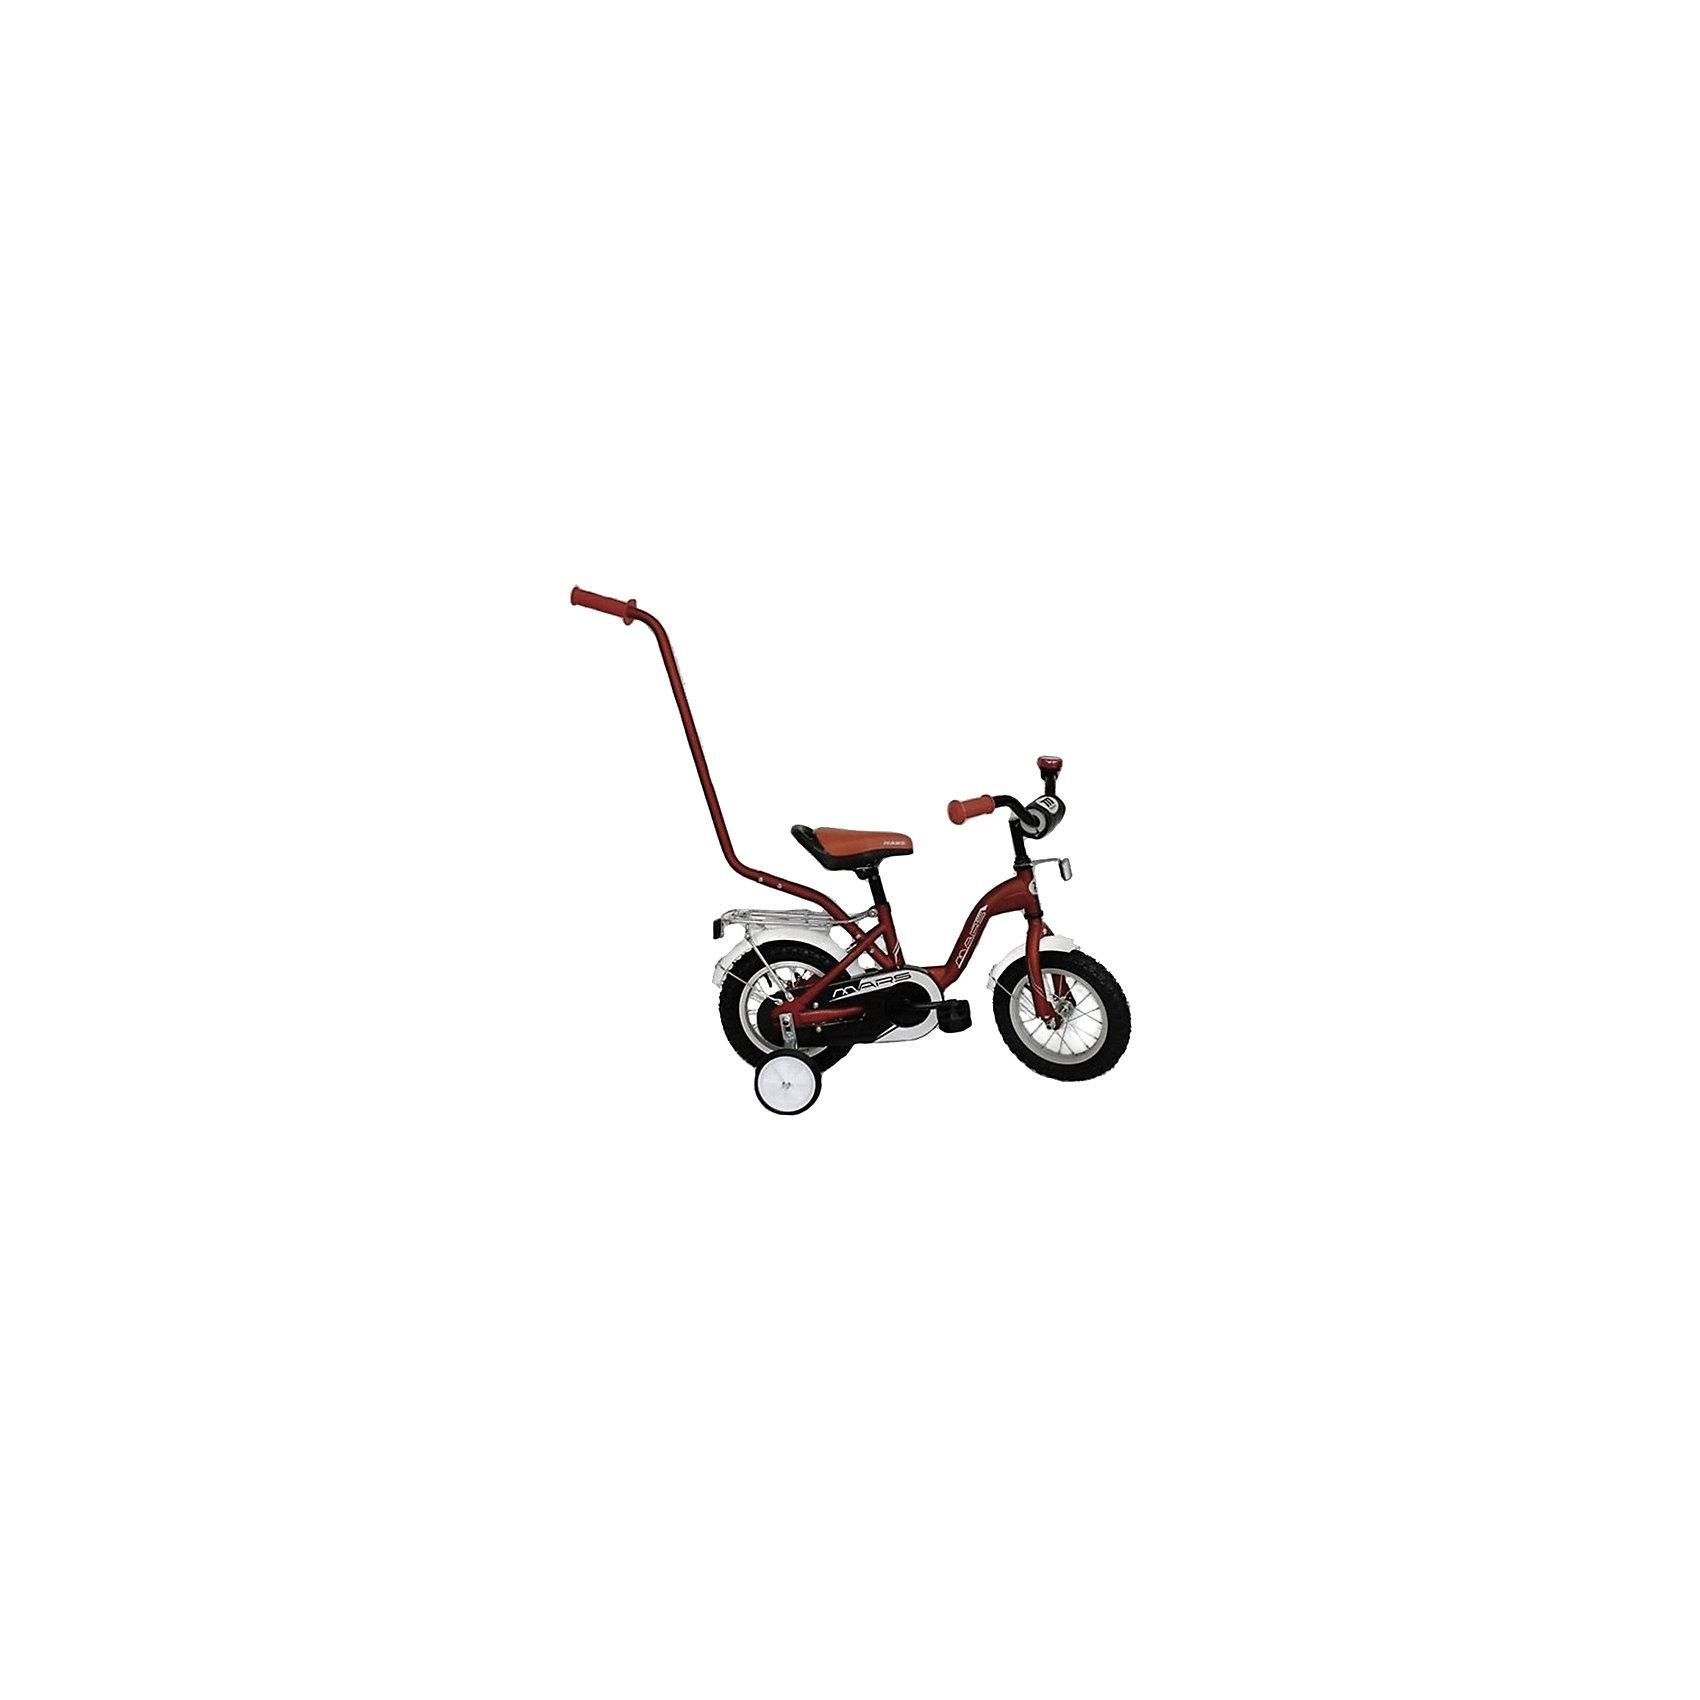 Велосипед, NEW MARS, коричневый<br><br>Ширина мм: 500<br>Глубина мм: 500<br>Высота мм: 1000<br>Вес г: 10000<br>Возраст от месяцев: 24<br>Возраст до месяцев: 60<br>Пол: Унисекс<br>Возраст: Детский<br>SKU: 4785494